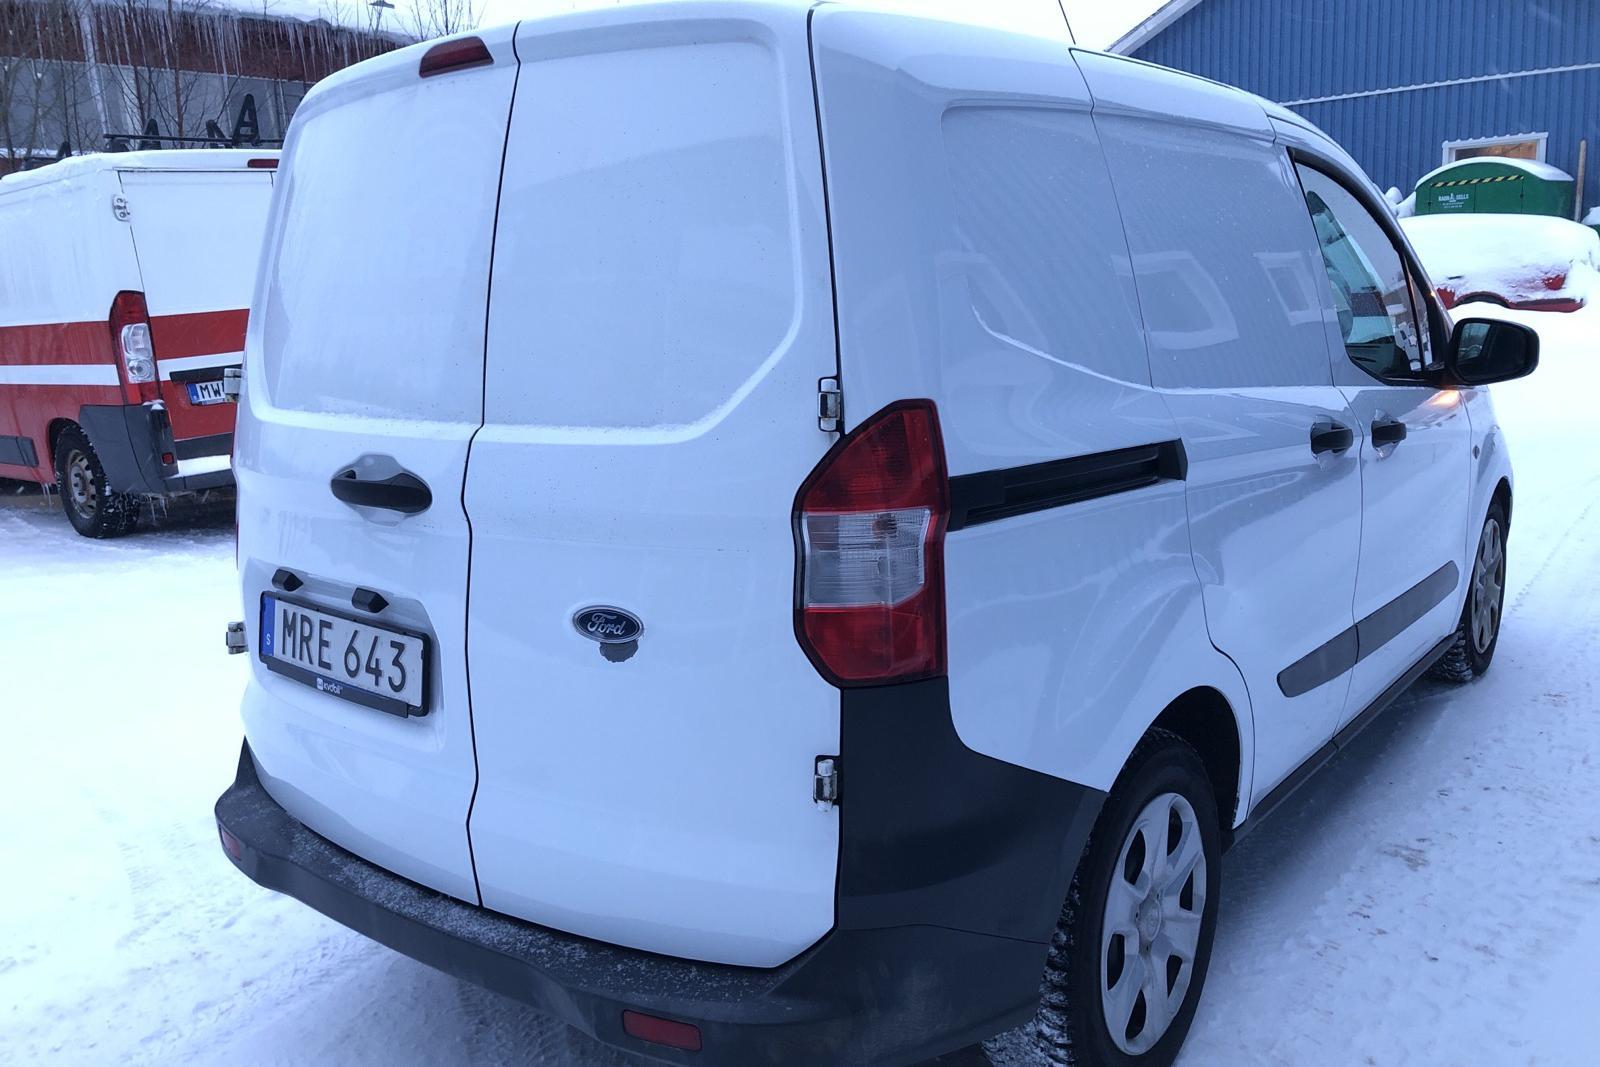 Ford Transit Courier 1.5 TDCI (75hk) - 130 100 km - Manual - white - 2017